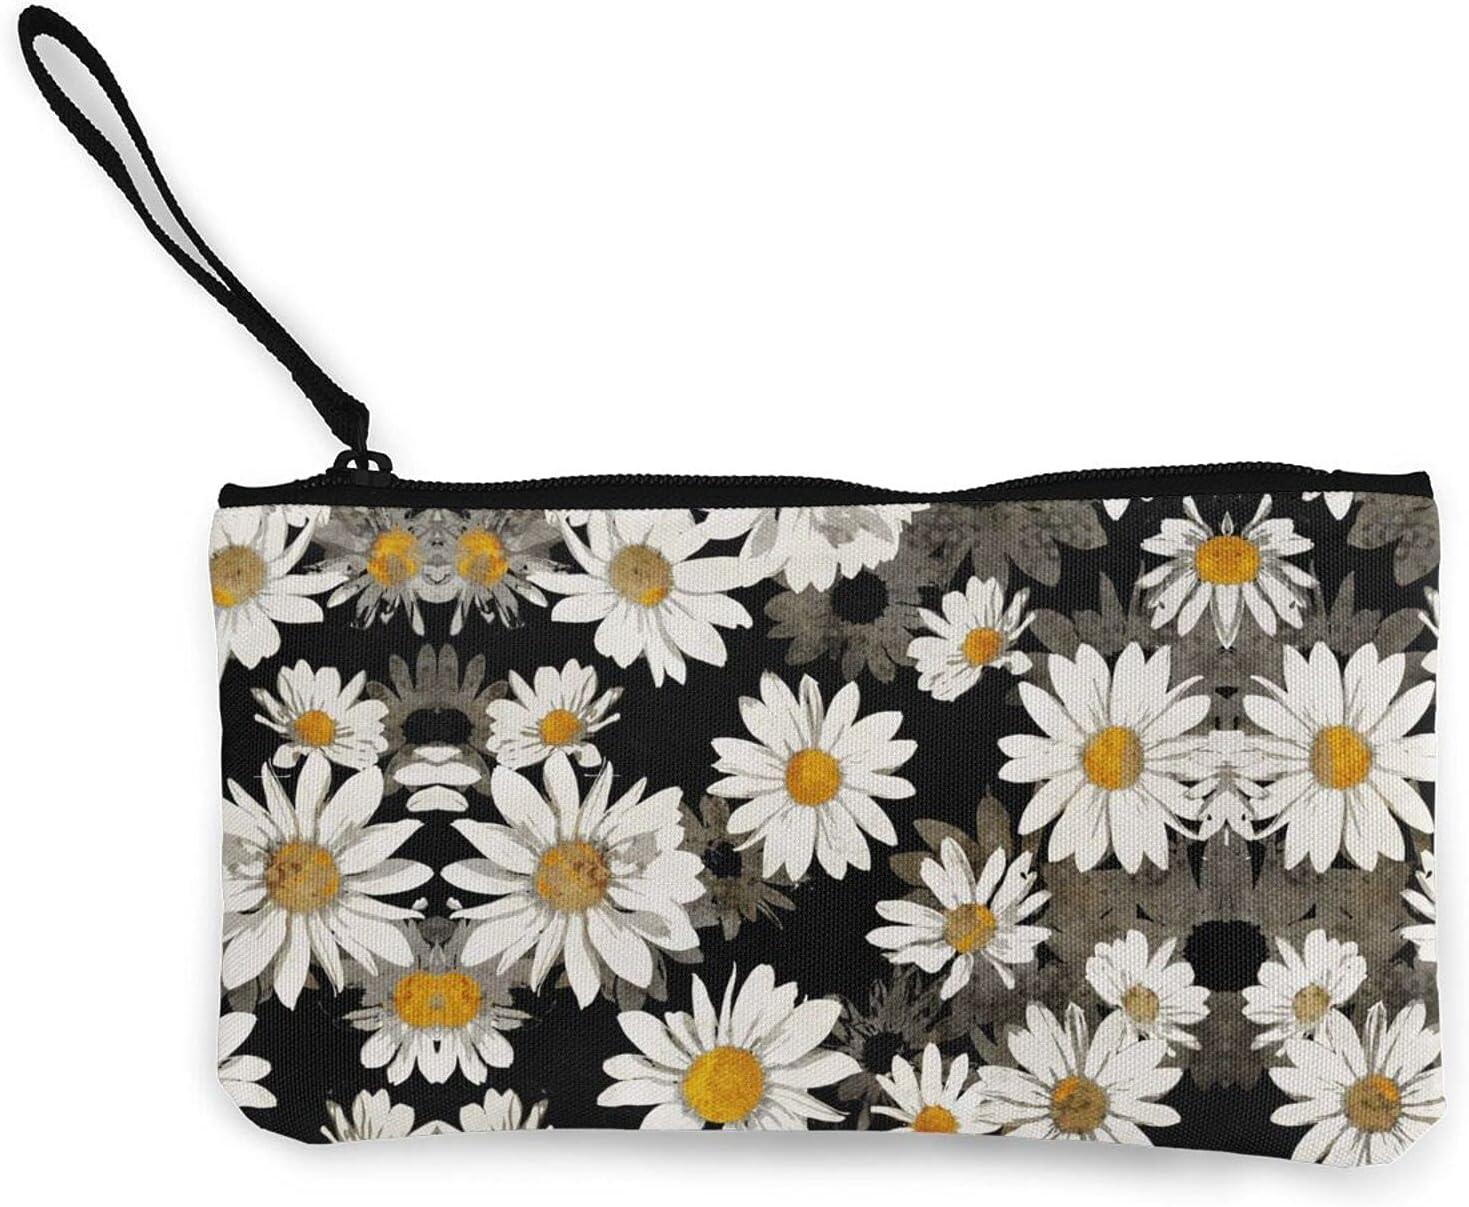 Floral White Daisy Zipper Pouch/ Canvas Coin Purse Wallet/ Cute Mini Change Wallet For Women/ Pouch Card Holder Phone Storage Bag